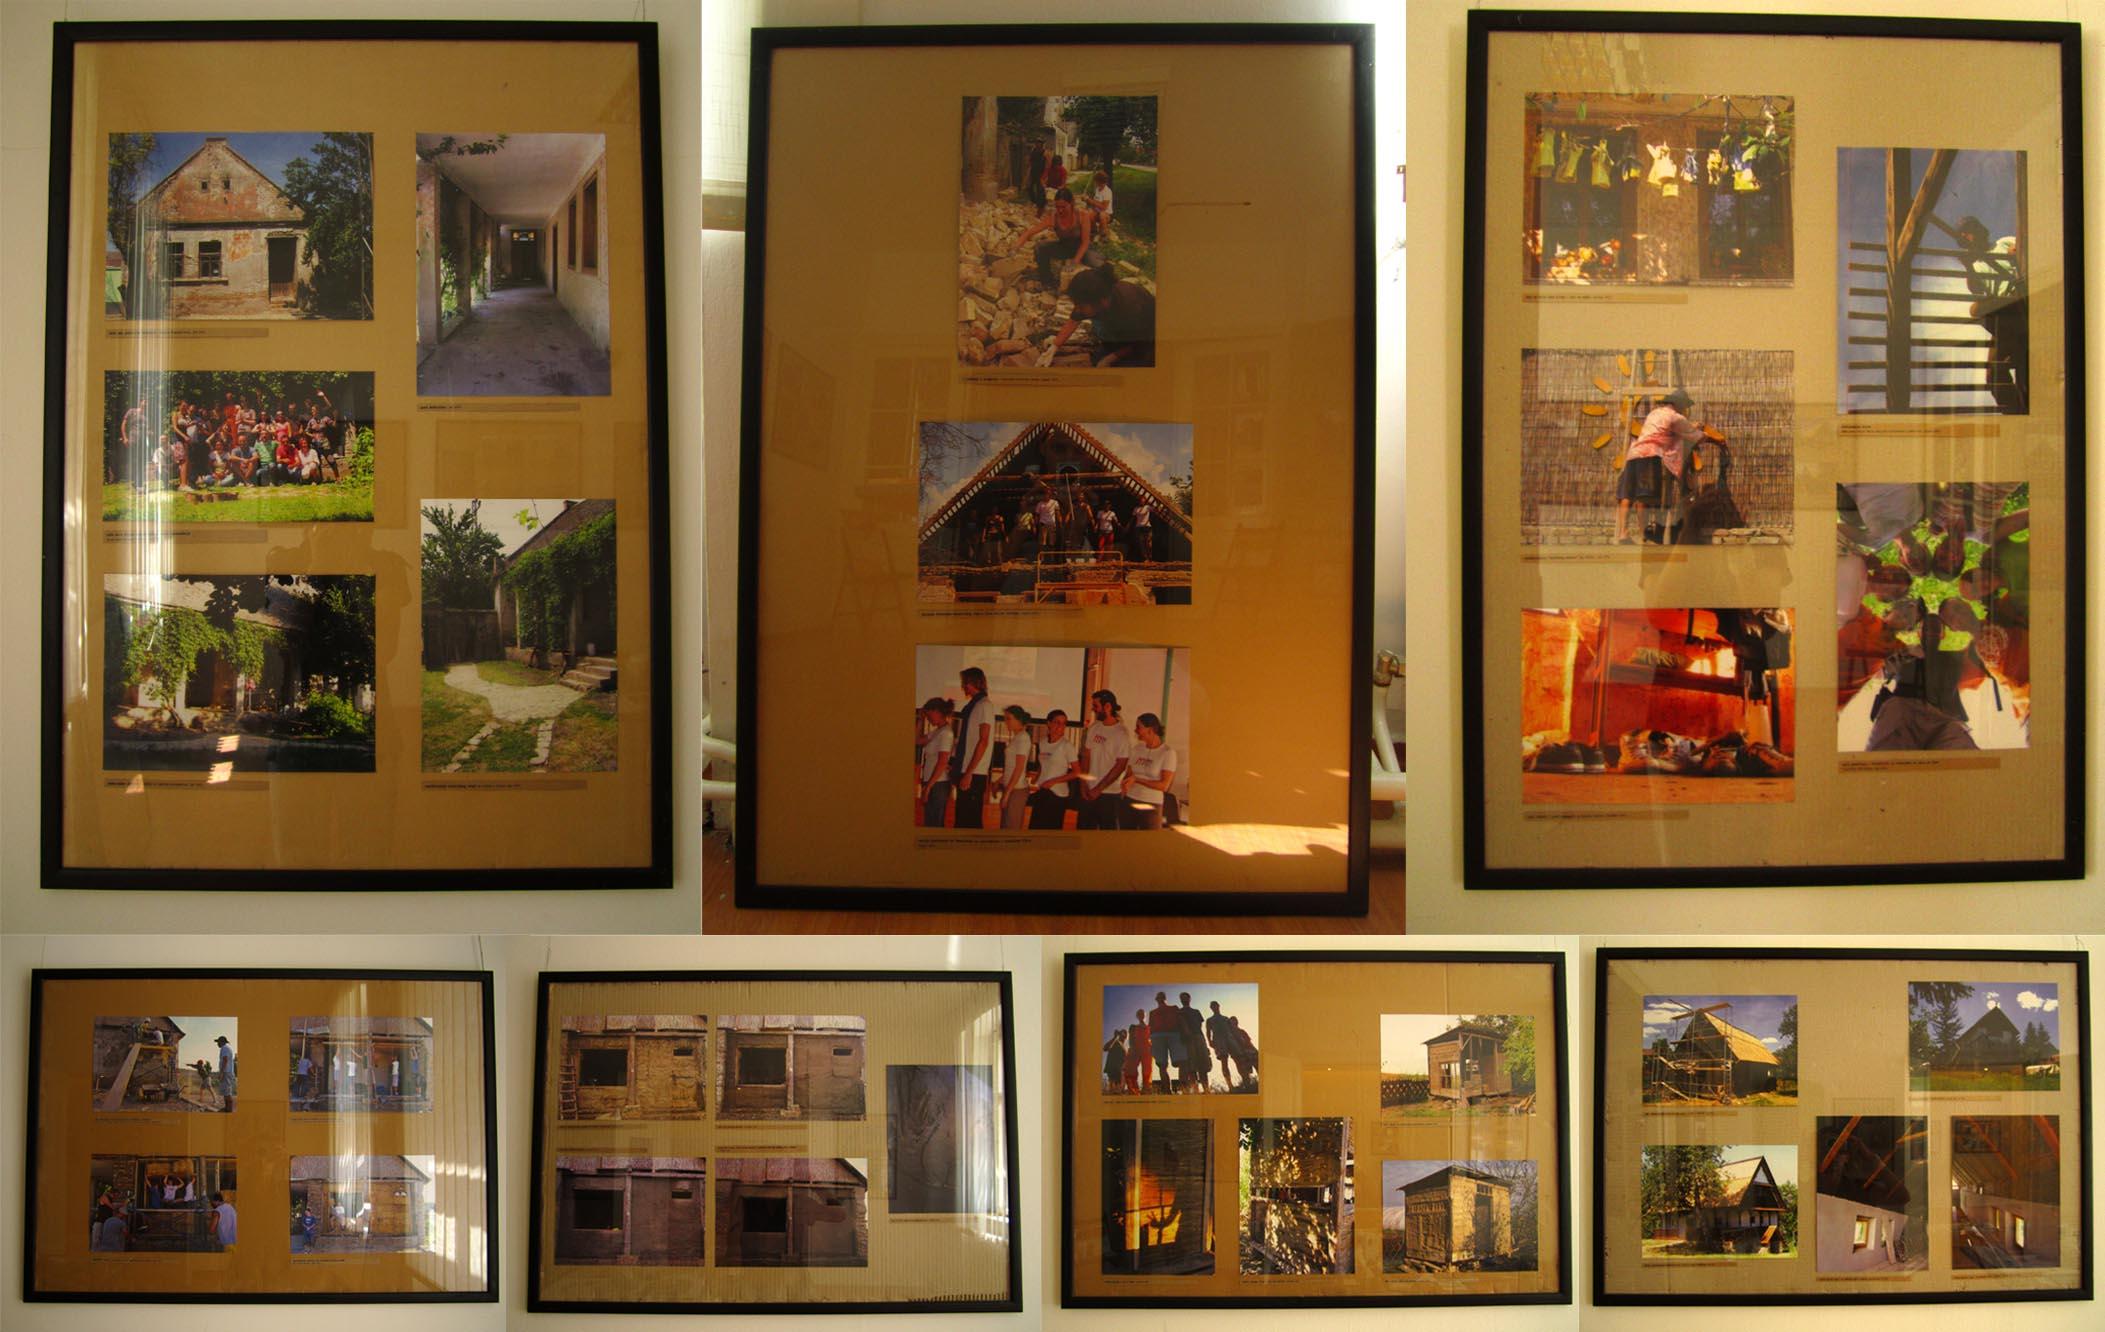 07 DANS oko arhitekture dragana marjanovic